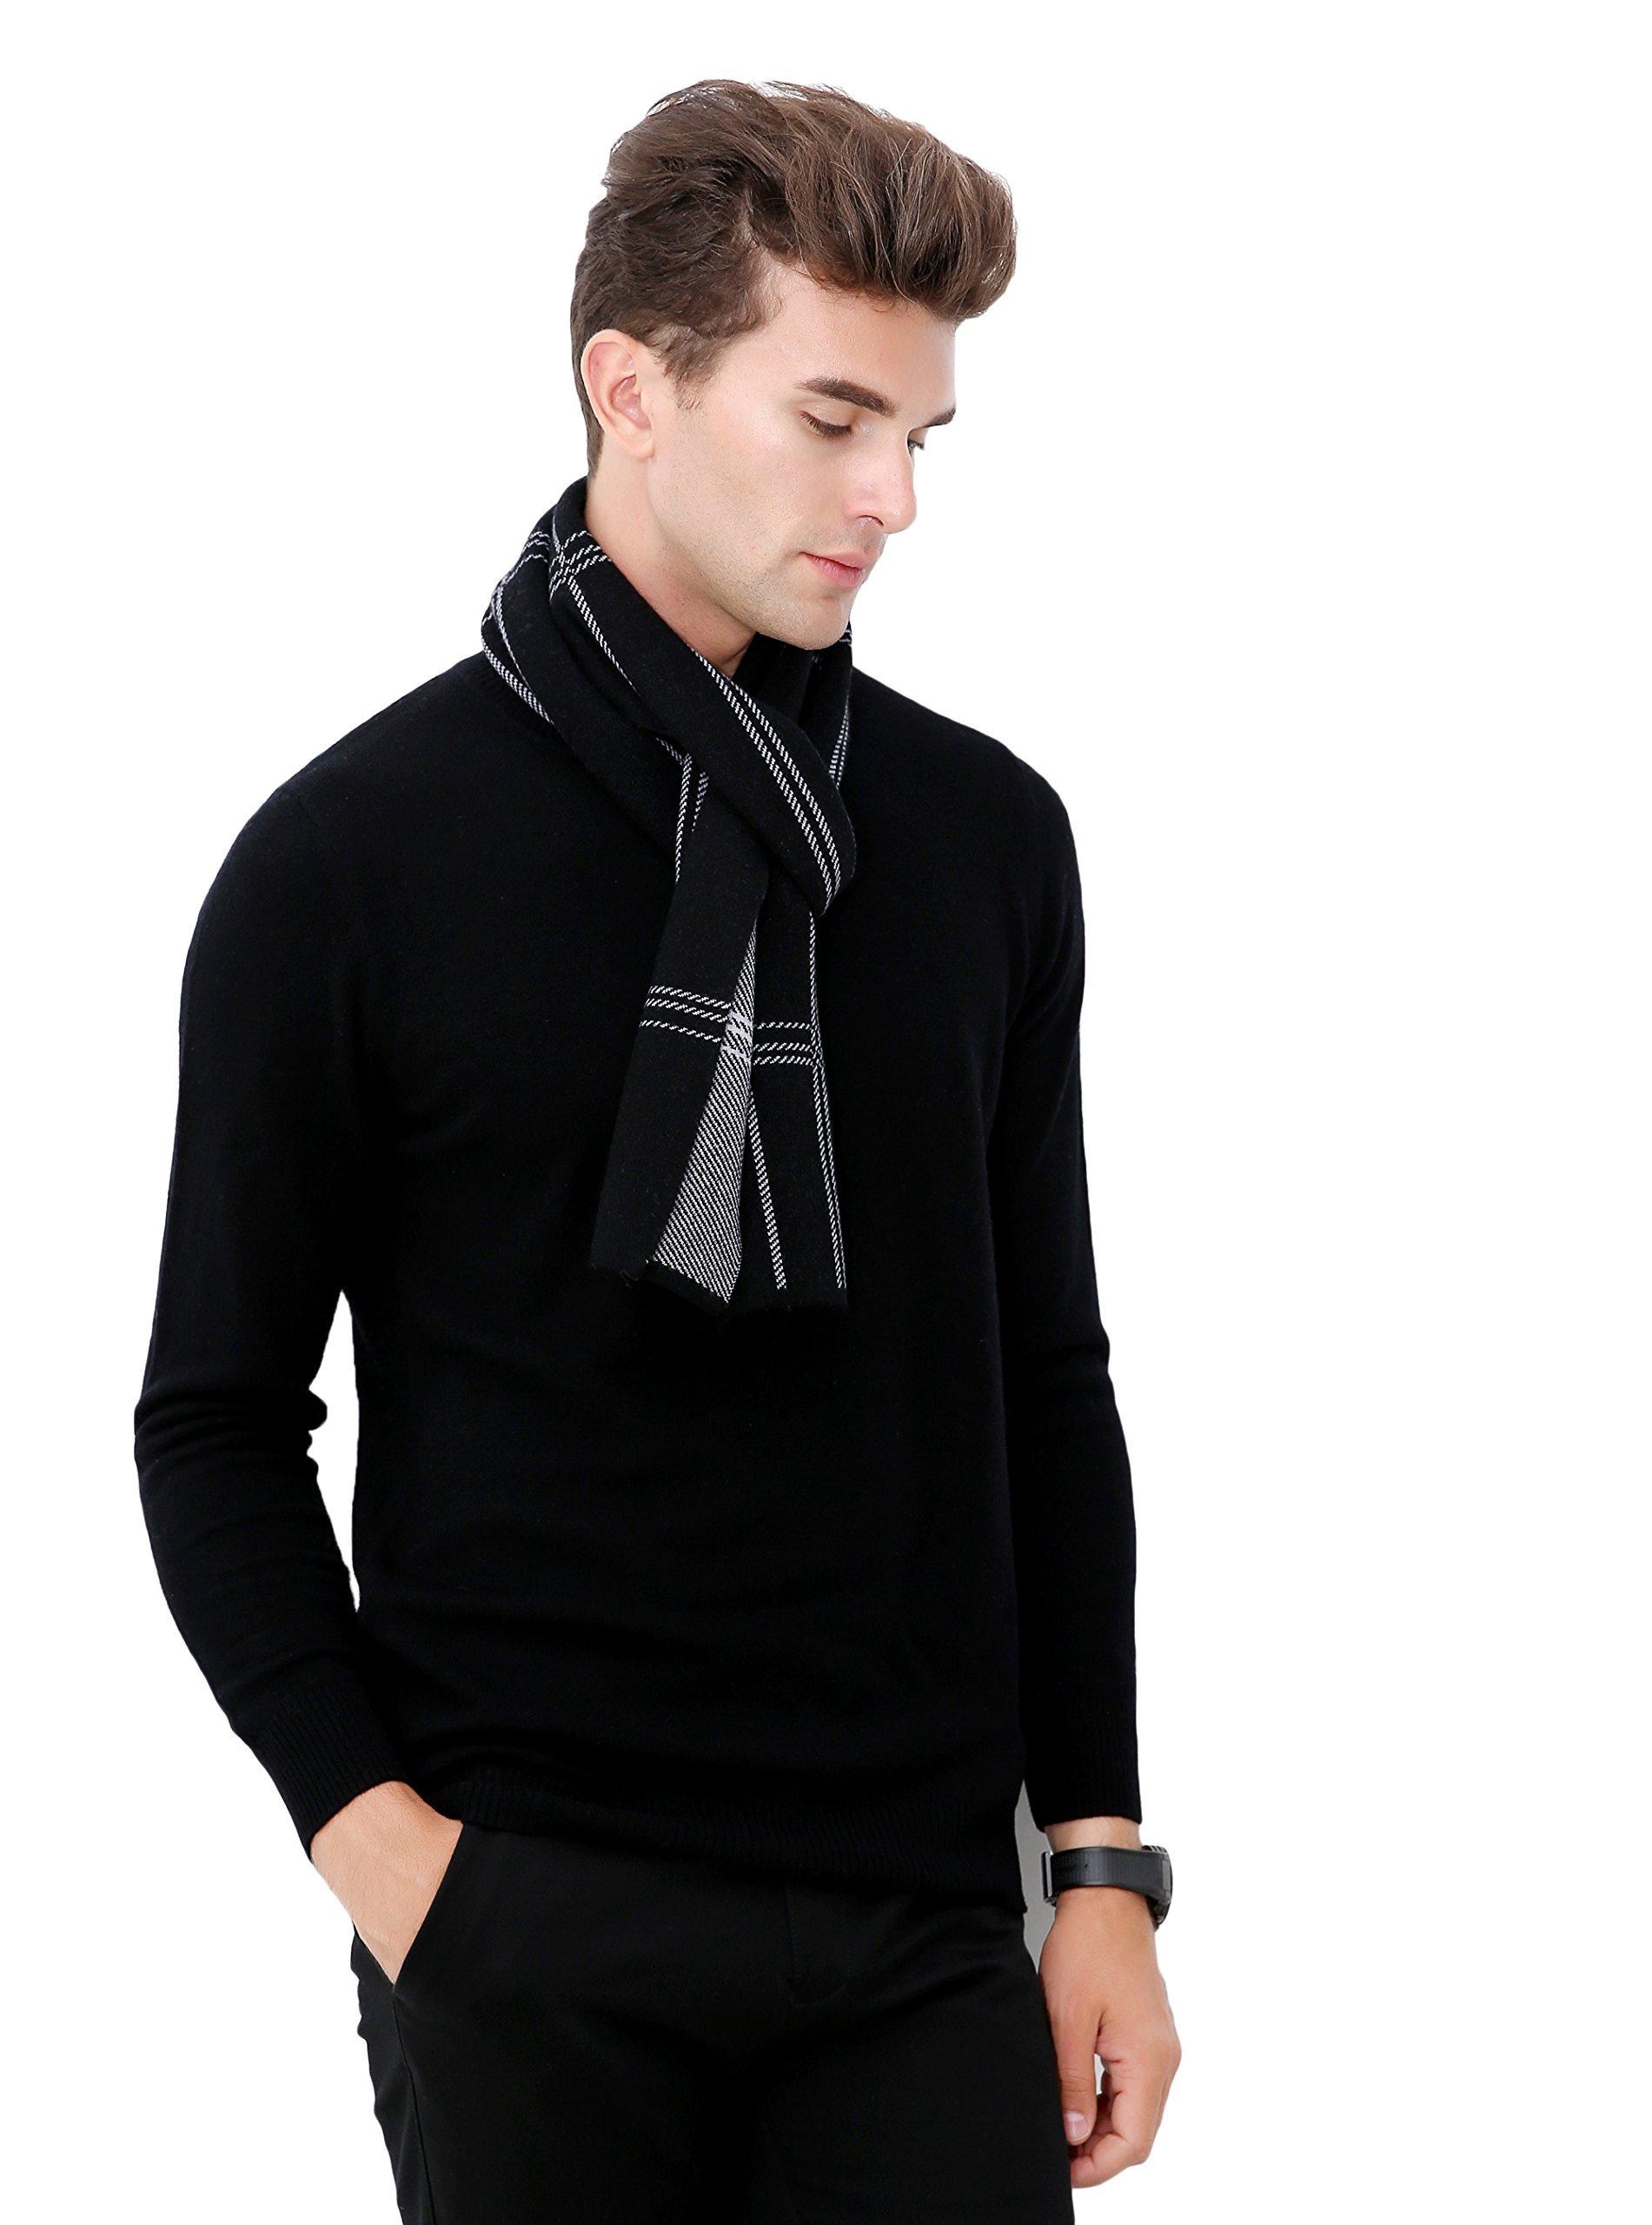 RIONA Men's Australian Merino Wool Plaid Knitted Scarf - Soft Warm Gentleman Neckwear with Gift Box